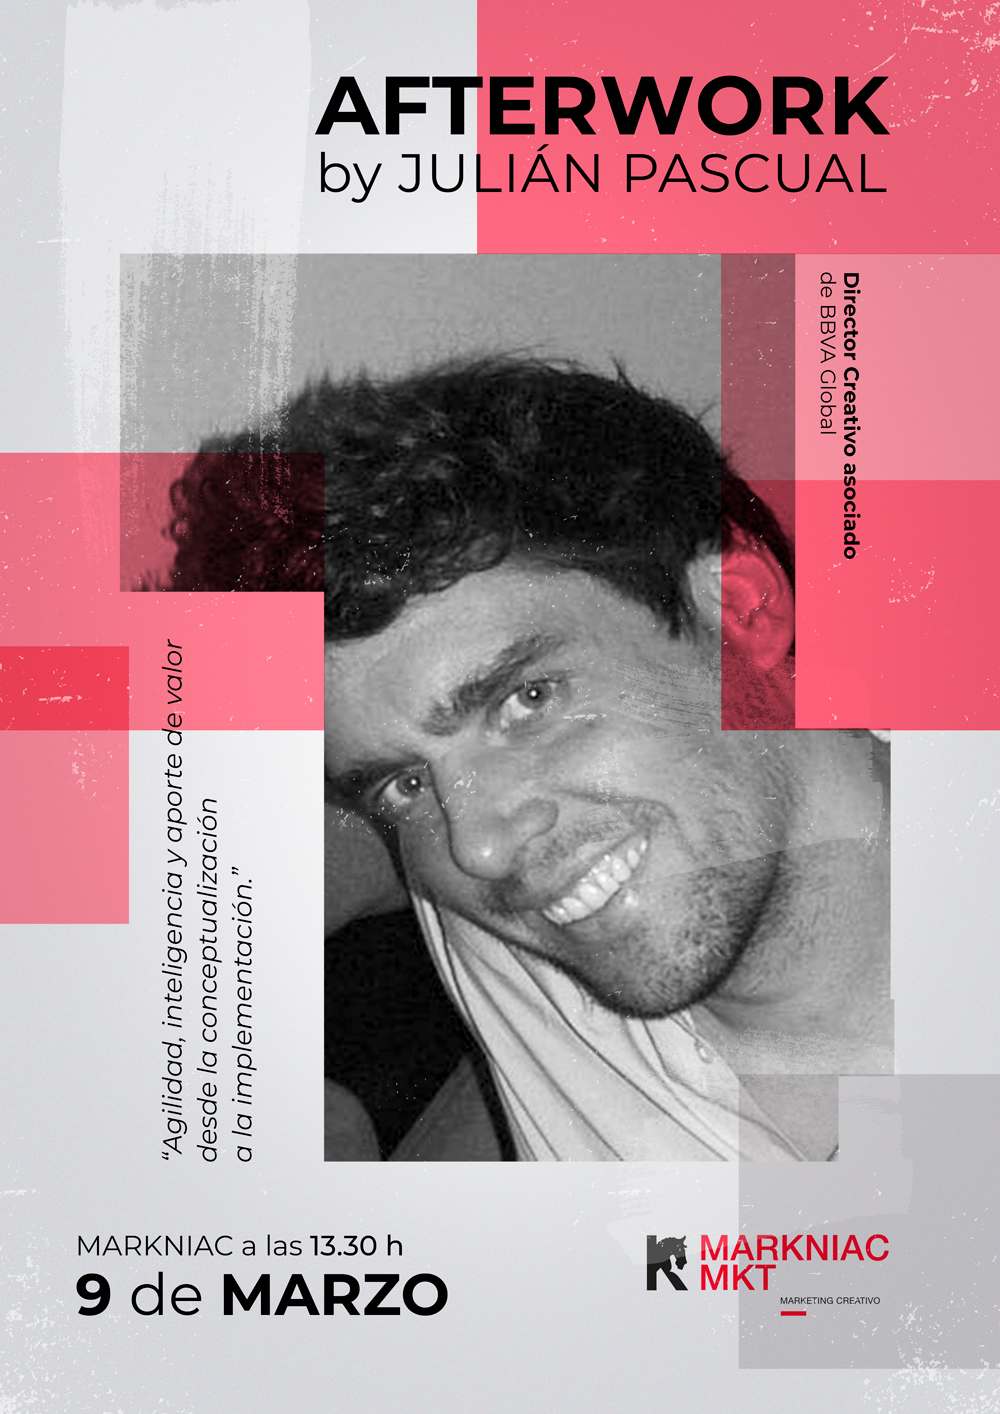 Julián Pascual<br><em>BBVA Global</em>